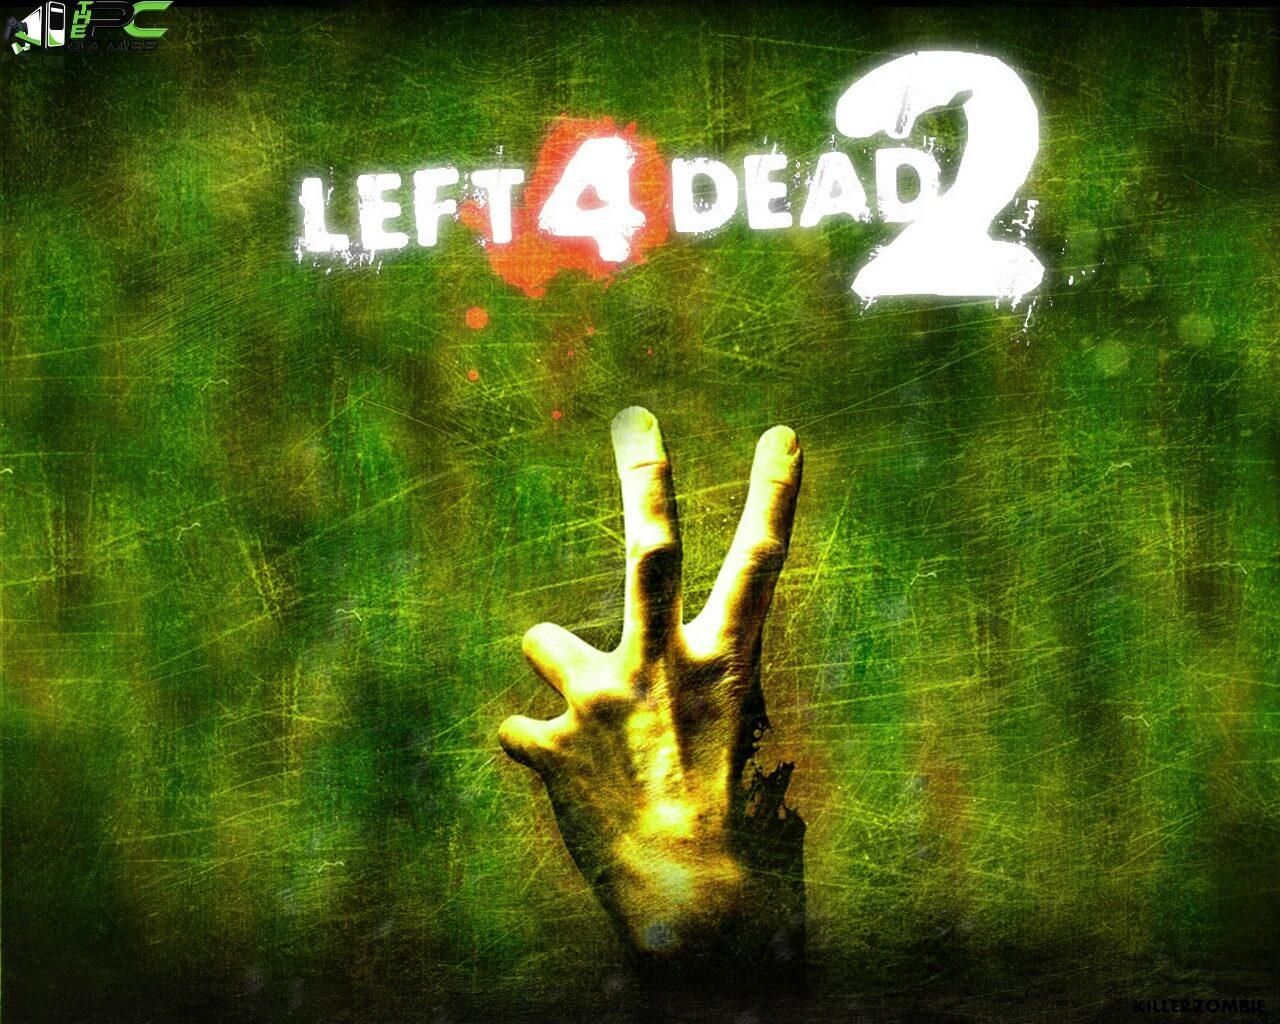 Left 4 Dead 2Free Download